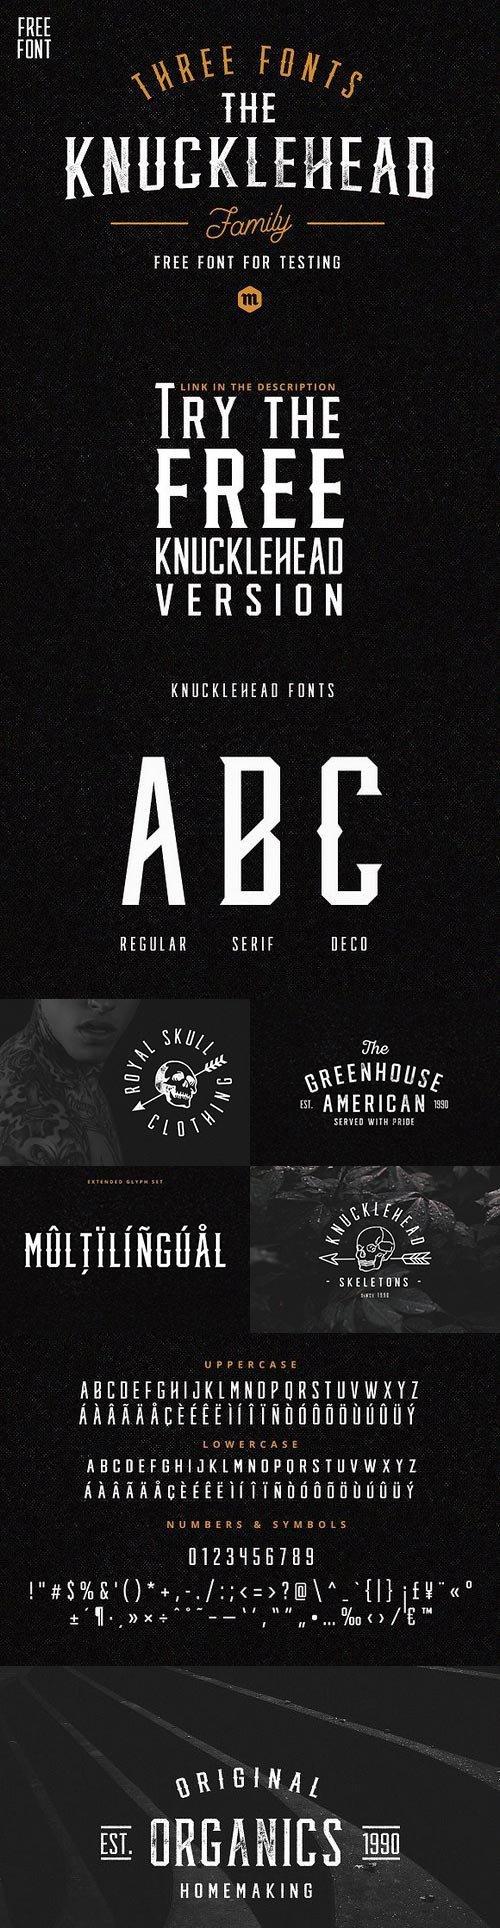 Knucklehead Typeface 953261